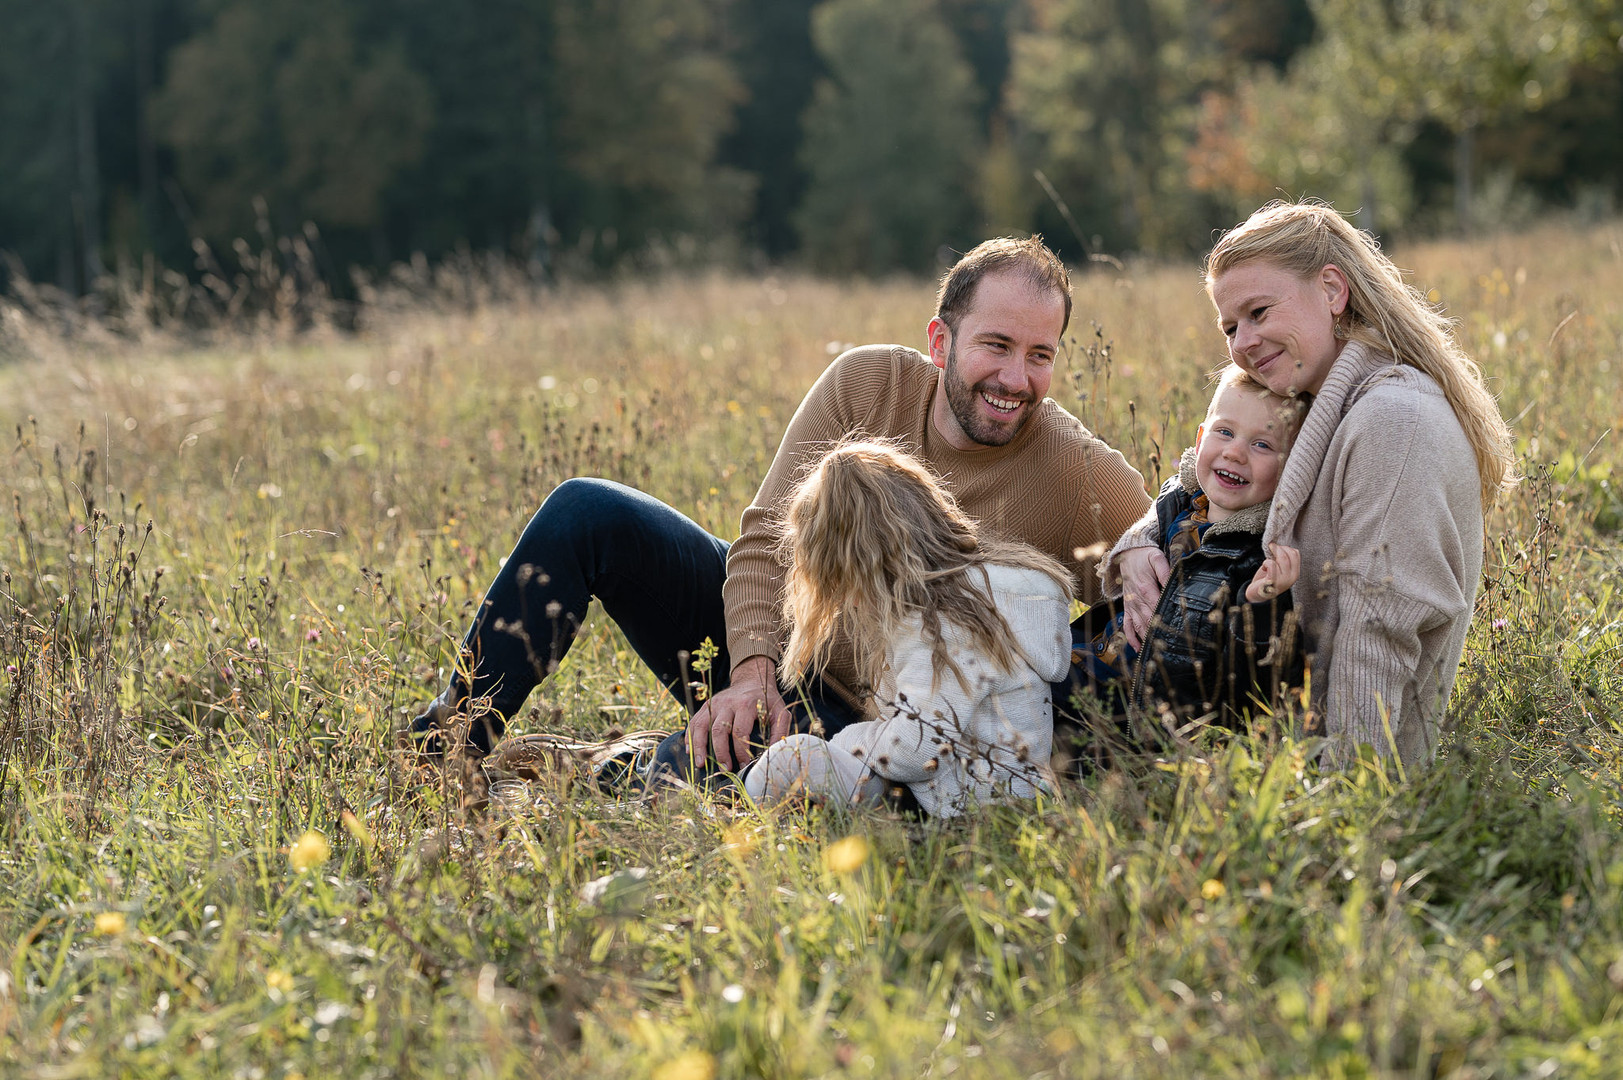 Familienfotos | jonas müller fotografie | zofingen